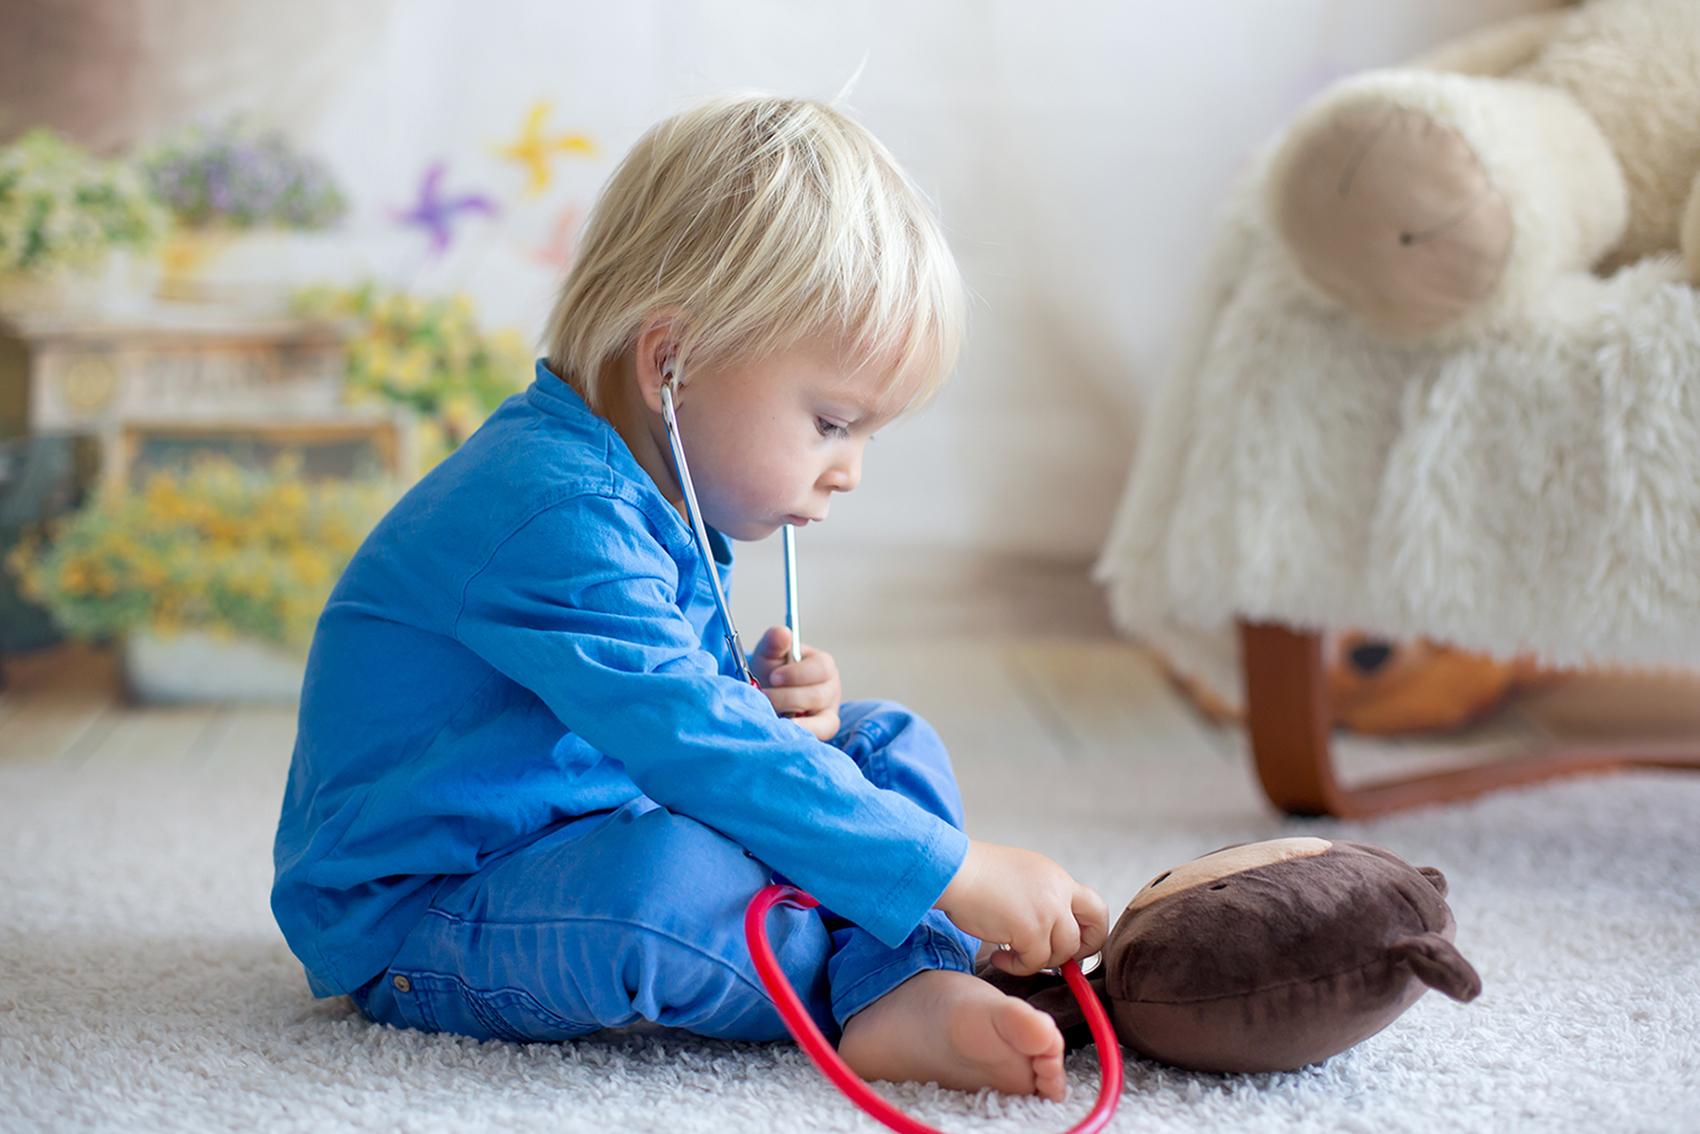 U1 bis U9 – Kindervorsorgeuntersuchungen im Überblick